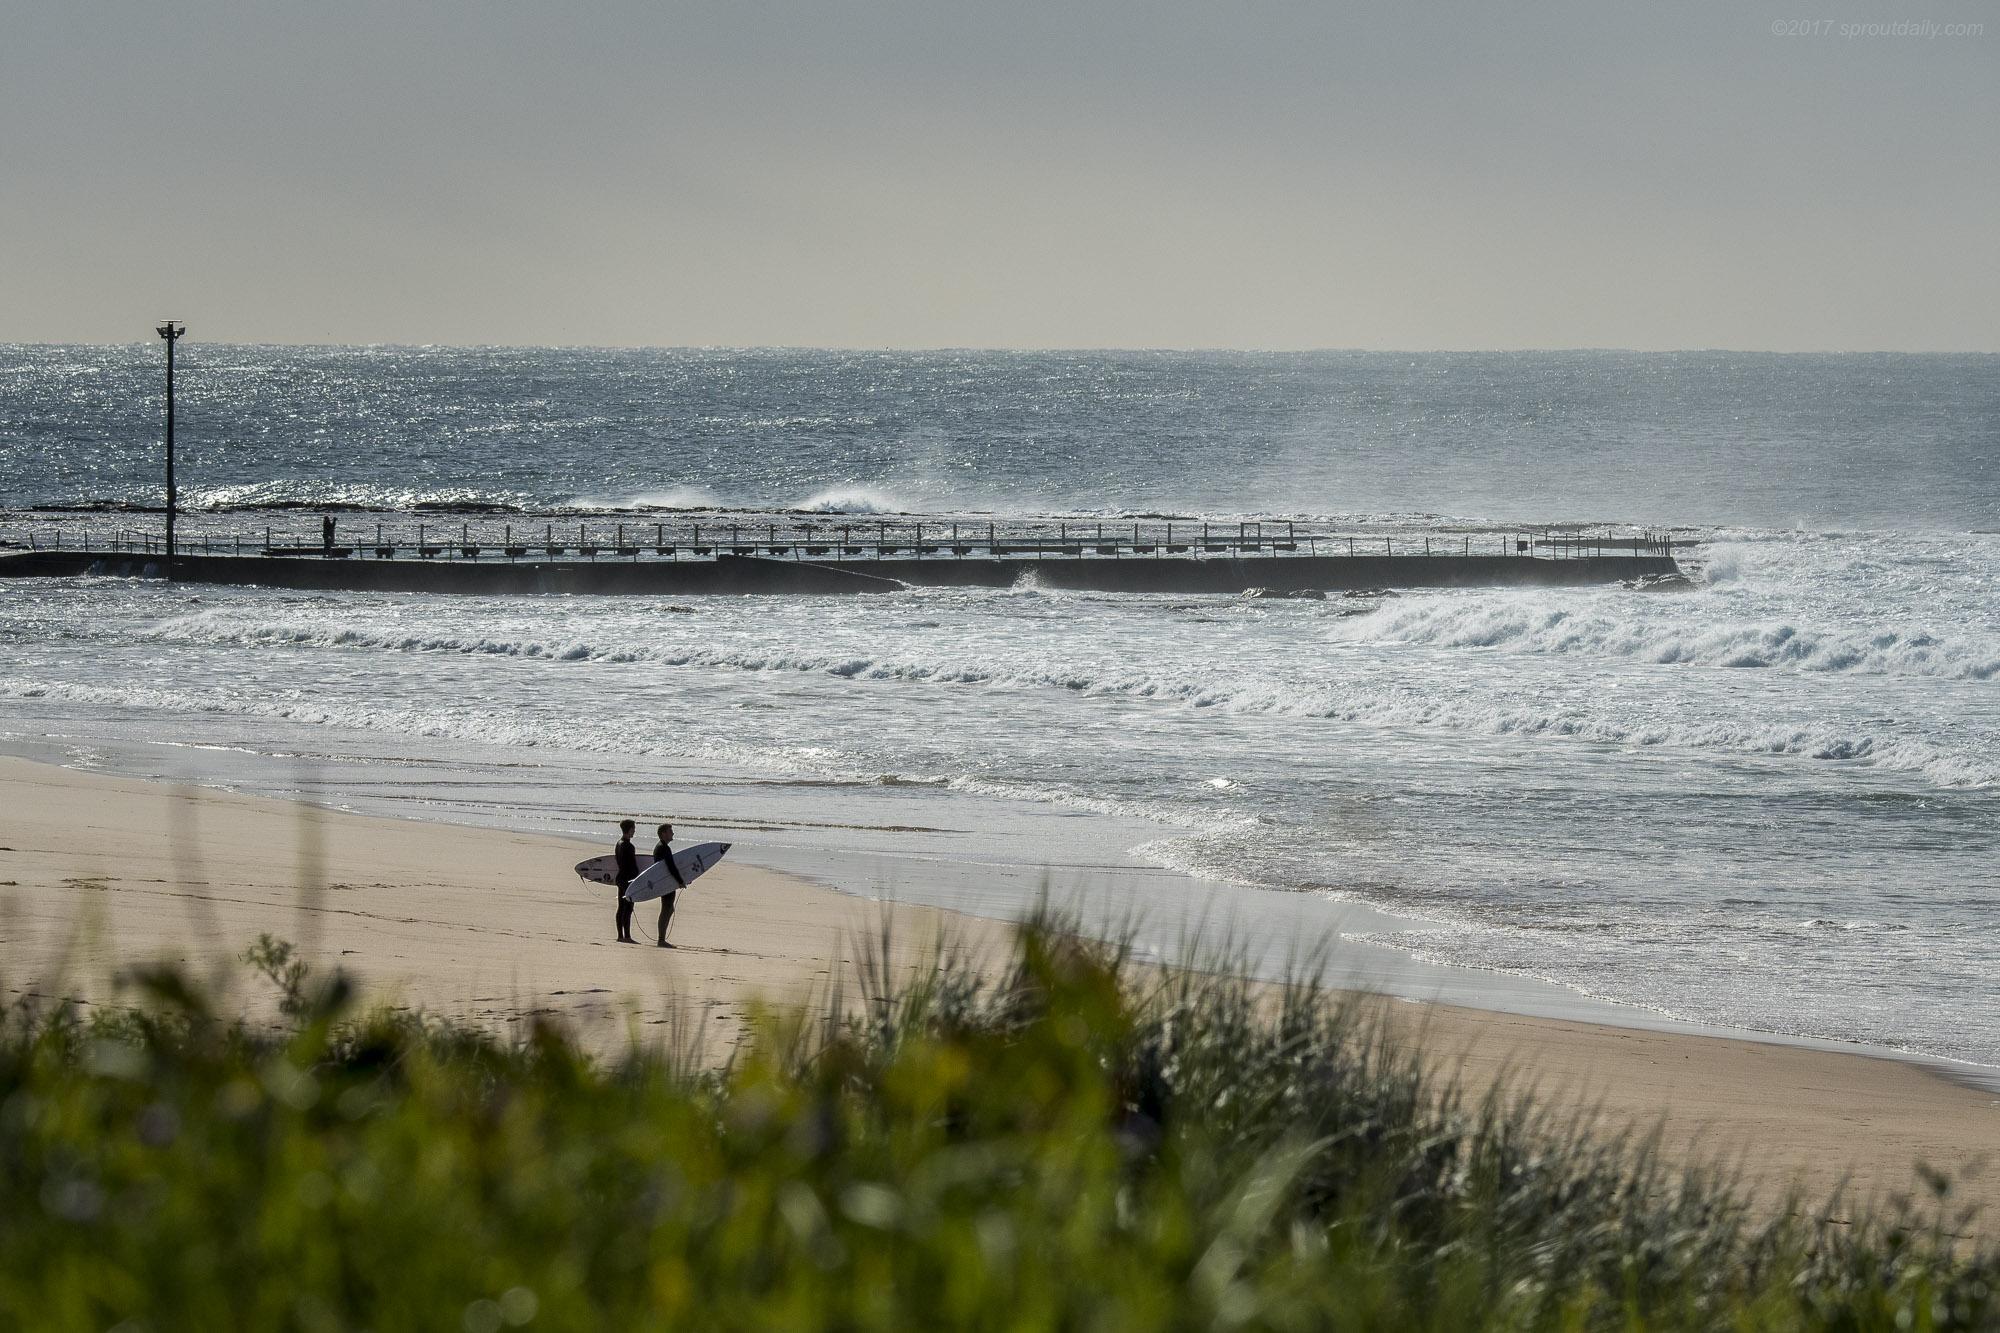 Post-Surf Moment